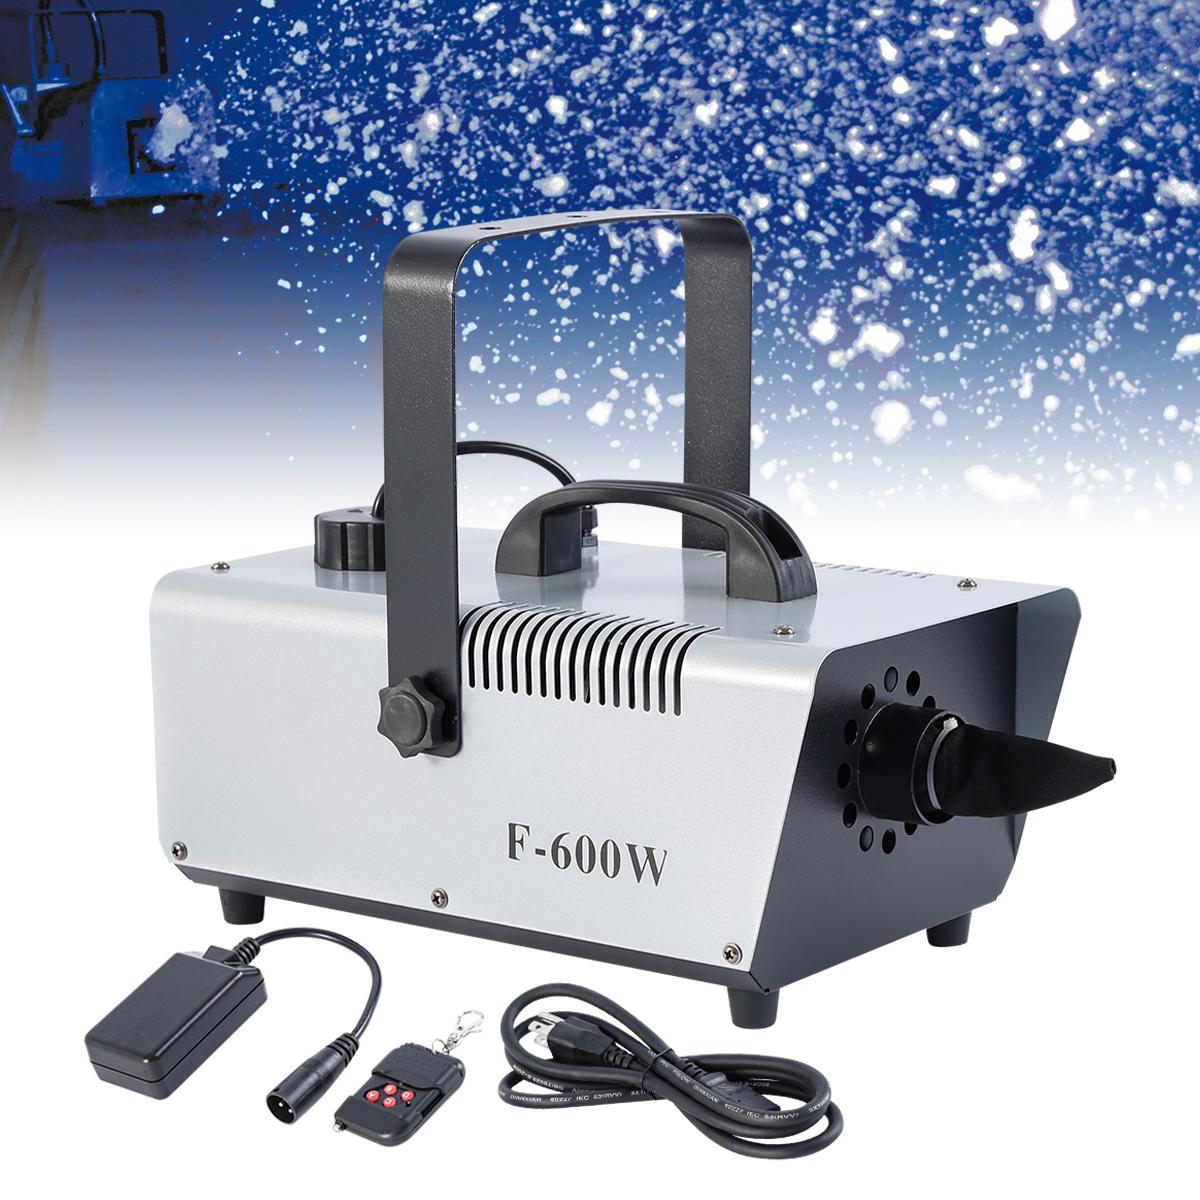 Snow Machine,600W Snowflake Maker Flake Effect Stage Show DJ Party Snow Machine Wireless Control Great Machine For Christmas Party Stage Show